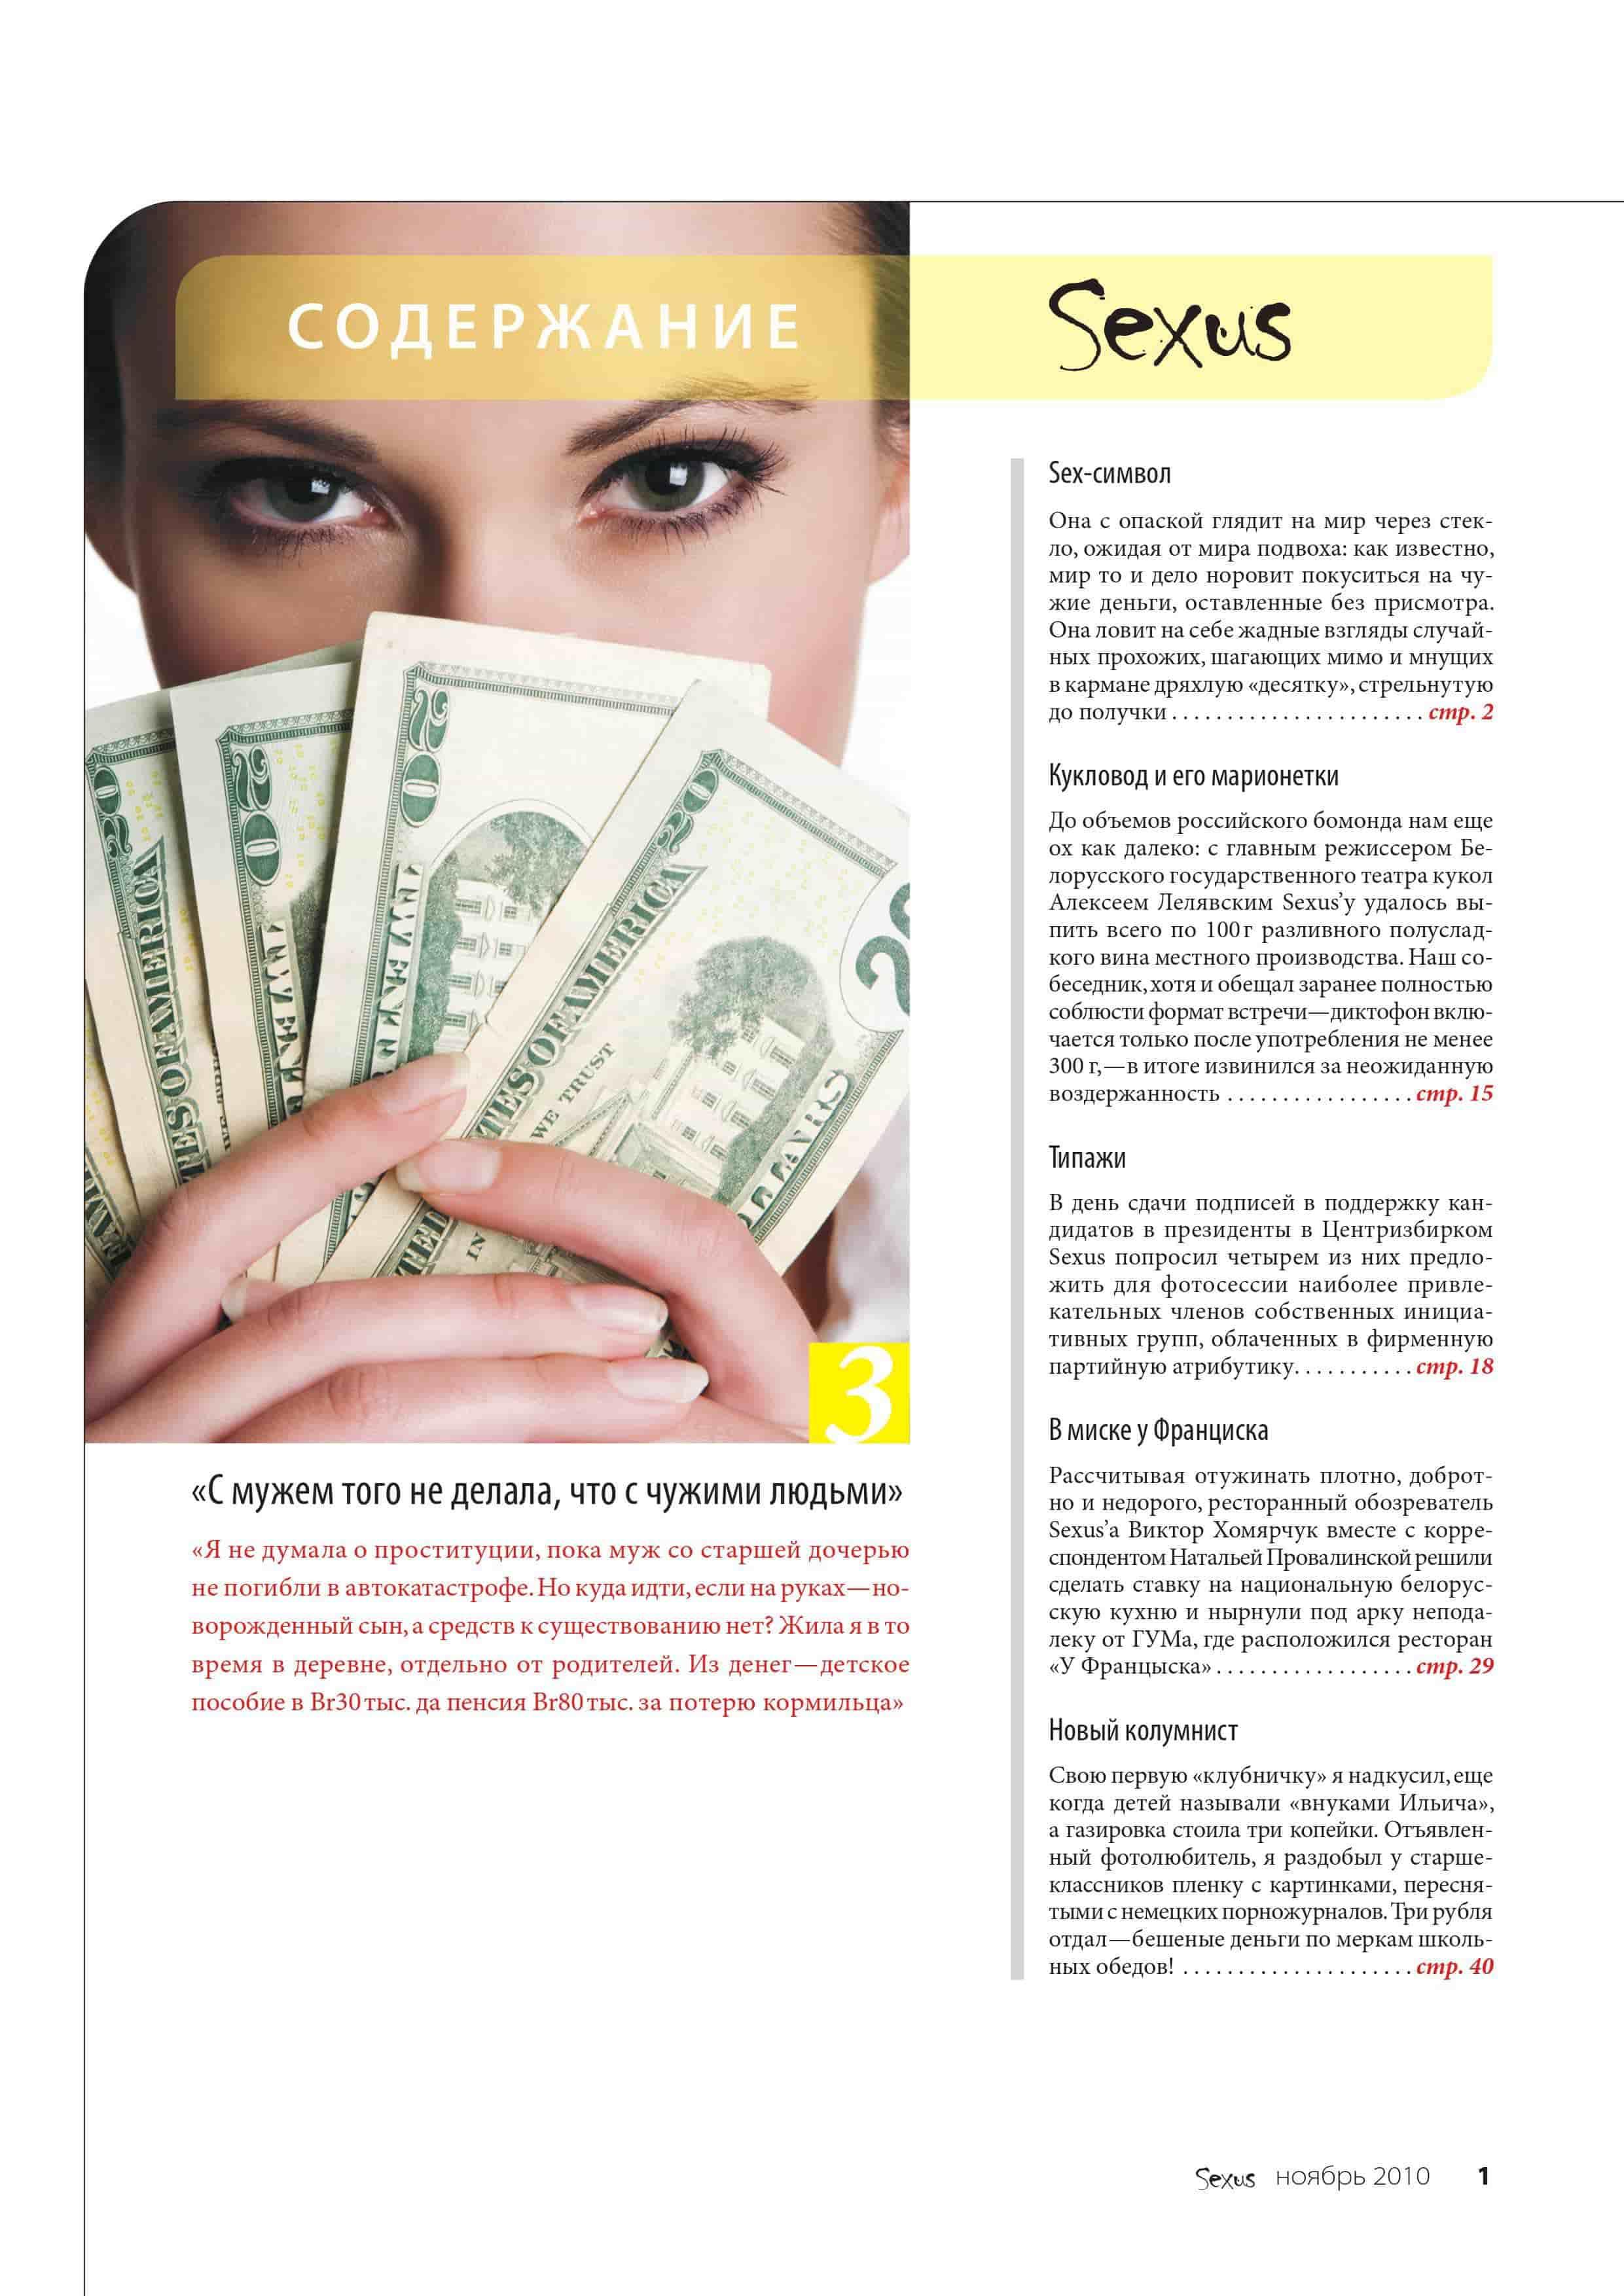 Пример журнал № 14